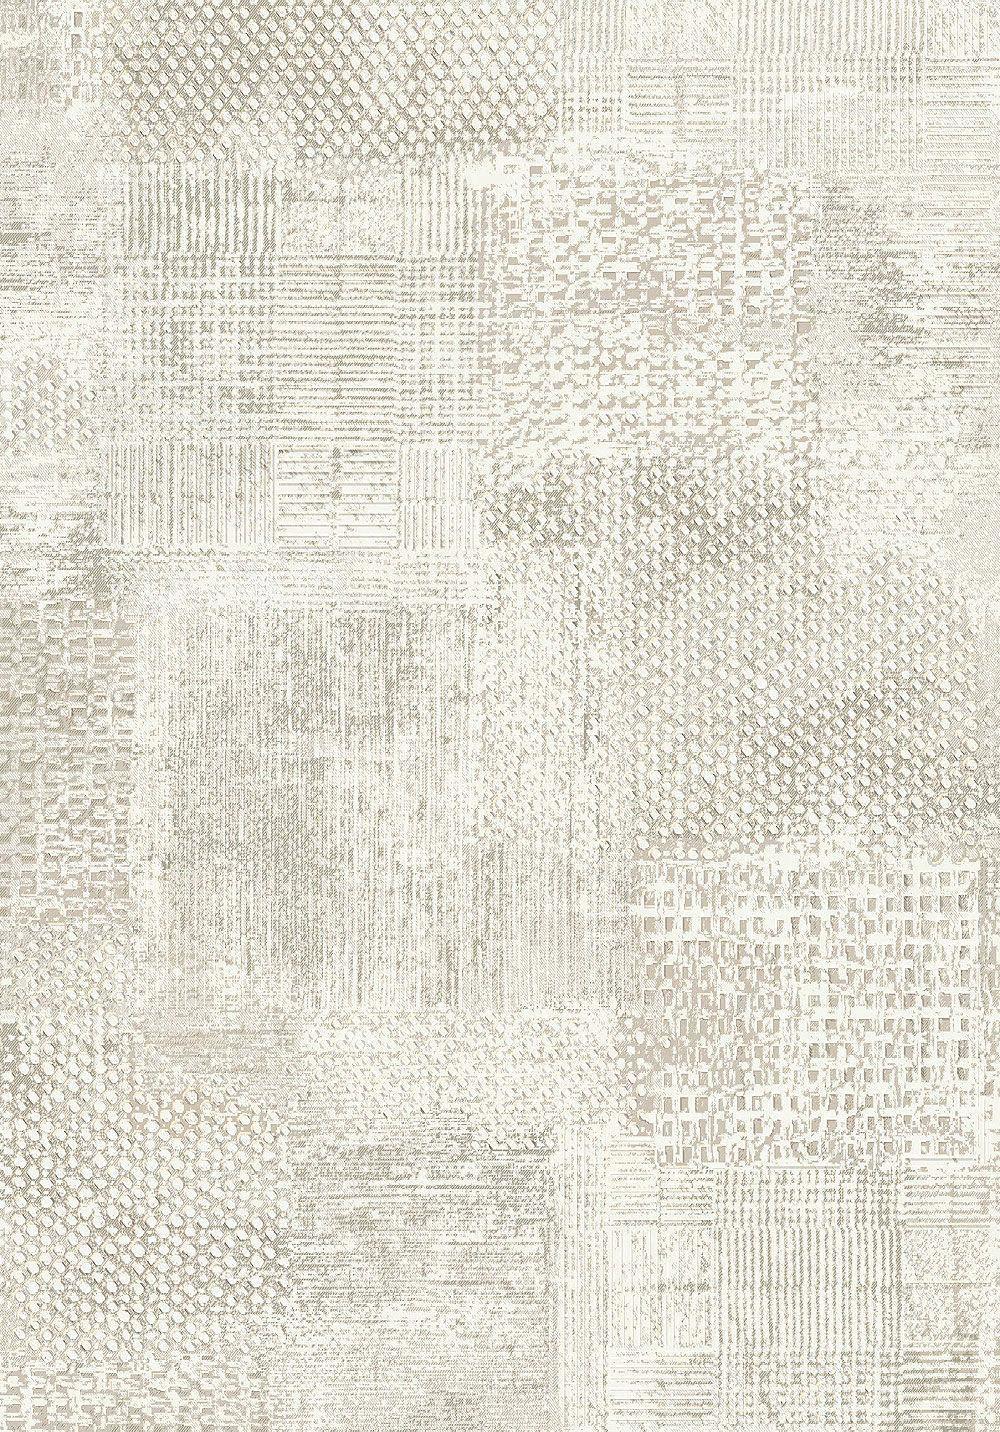 Vinyl Carpet Runners By The Foot CarpetRunnersForOffice